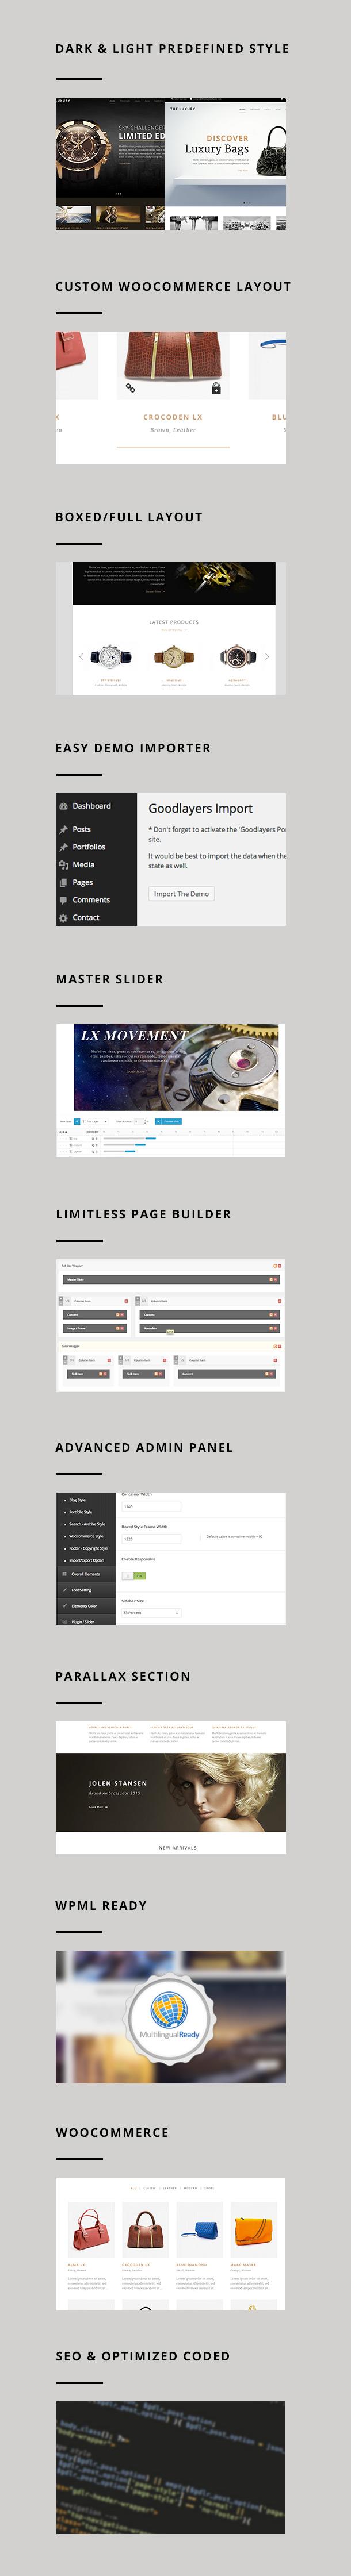 screen 1 - The Luxury - Dark / Light Responsive WordPress